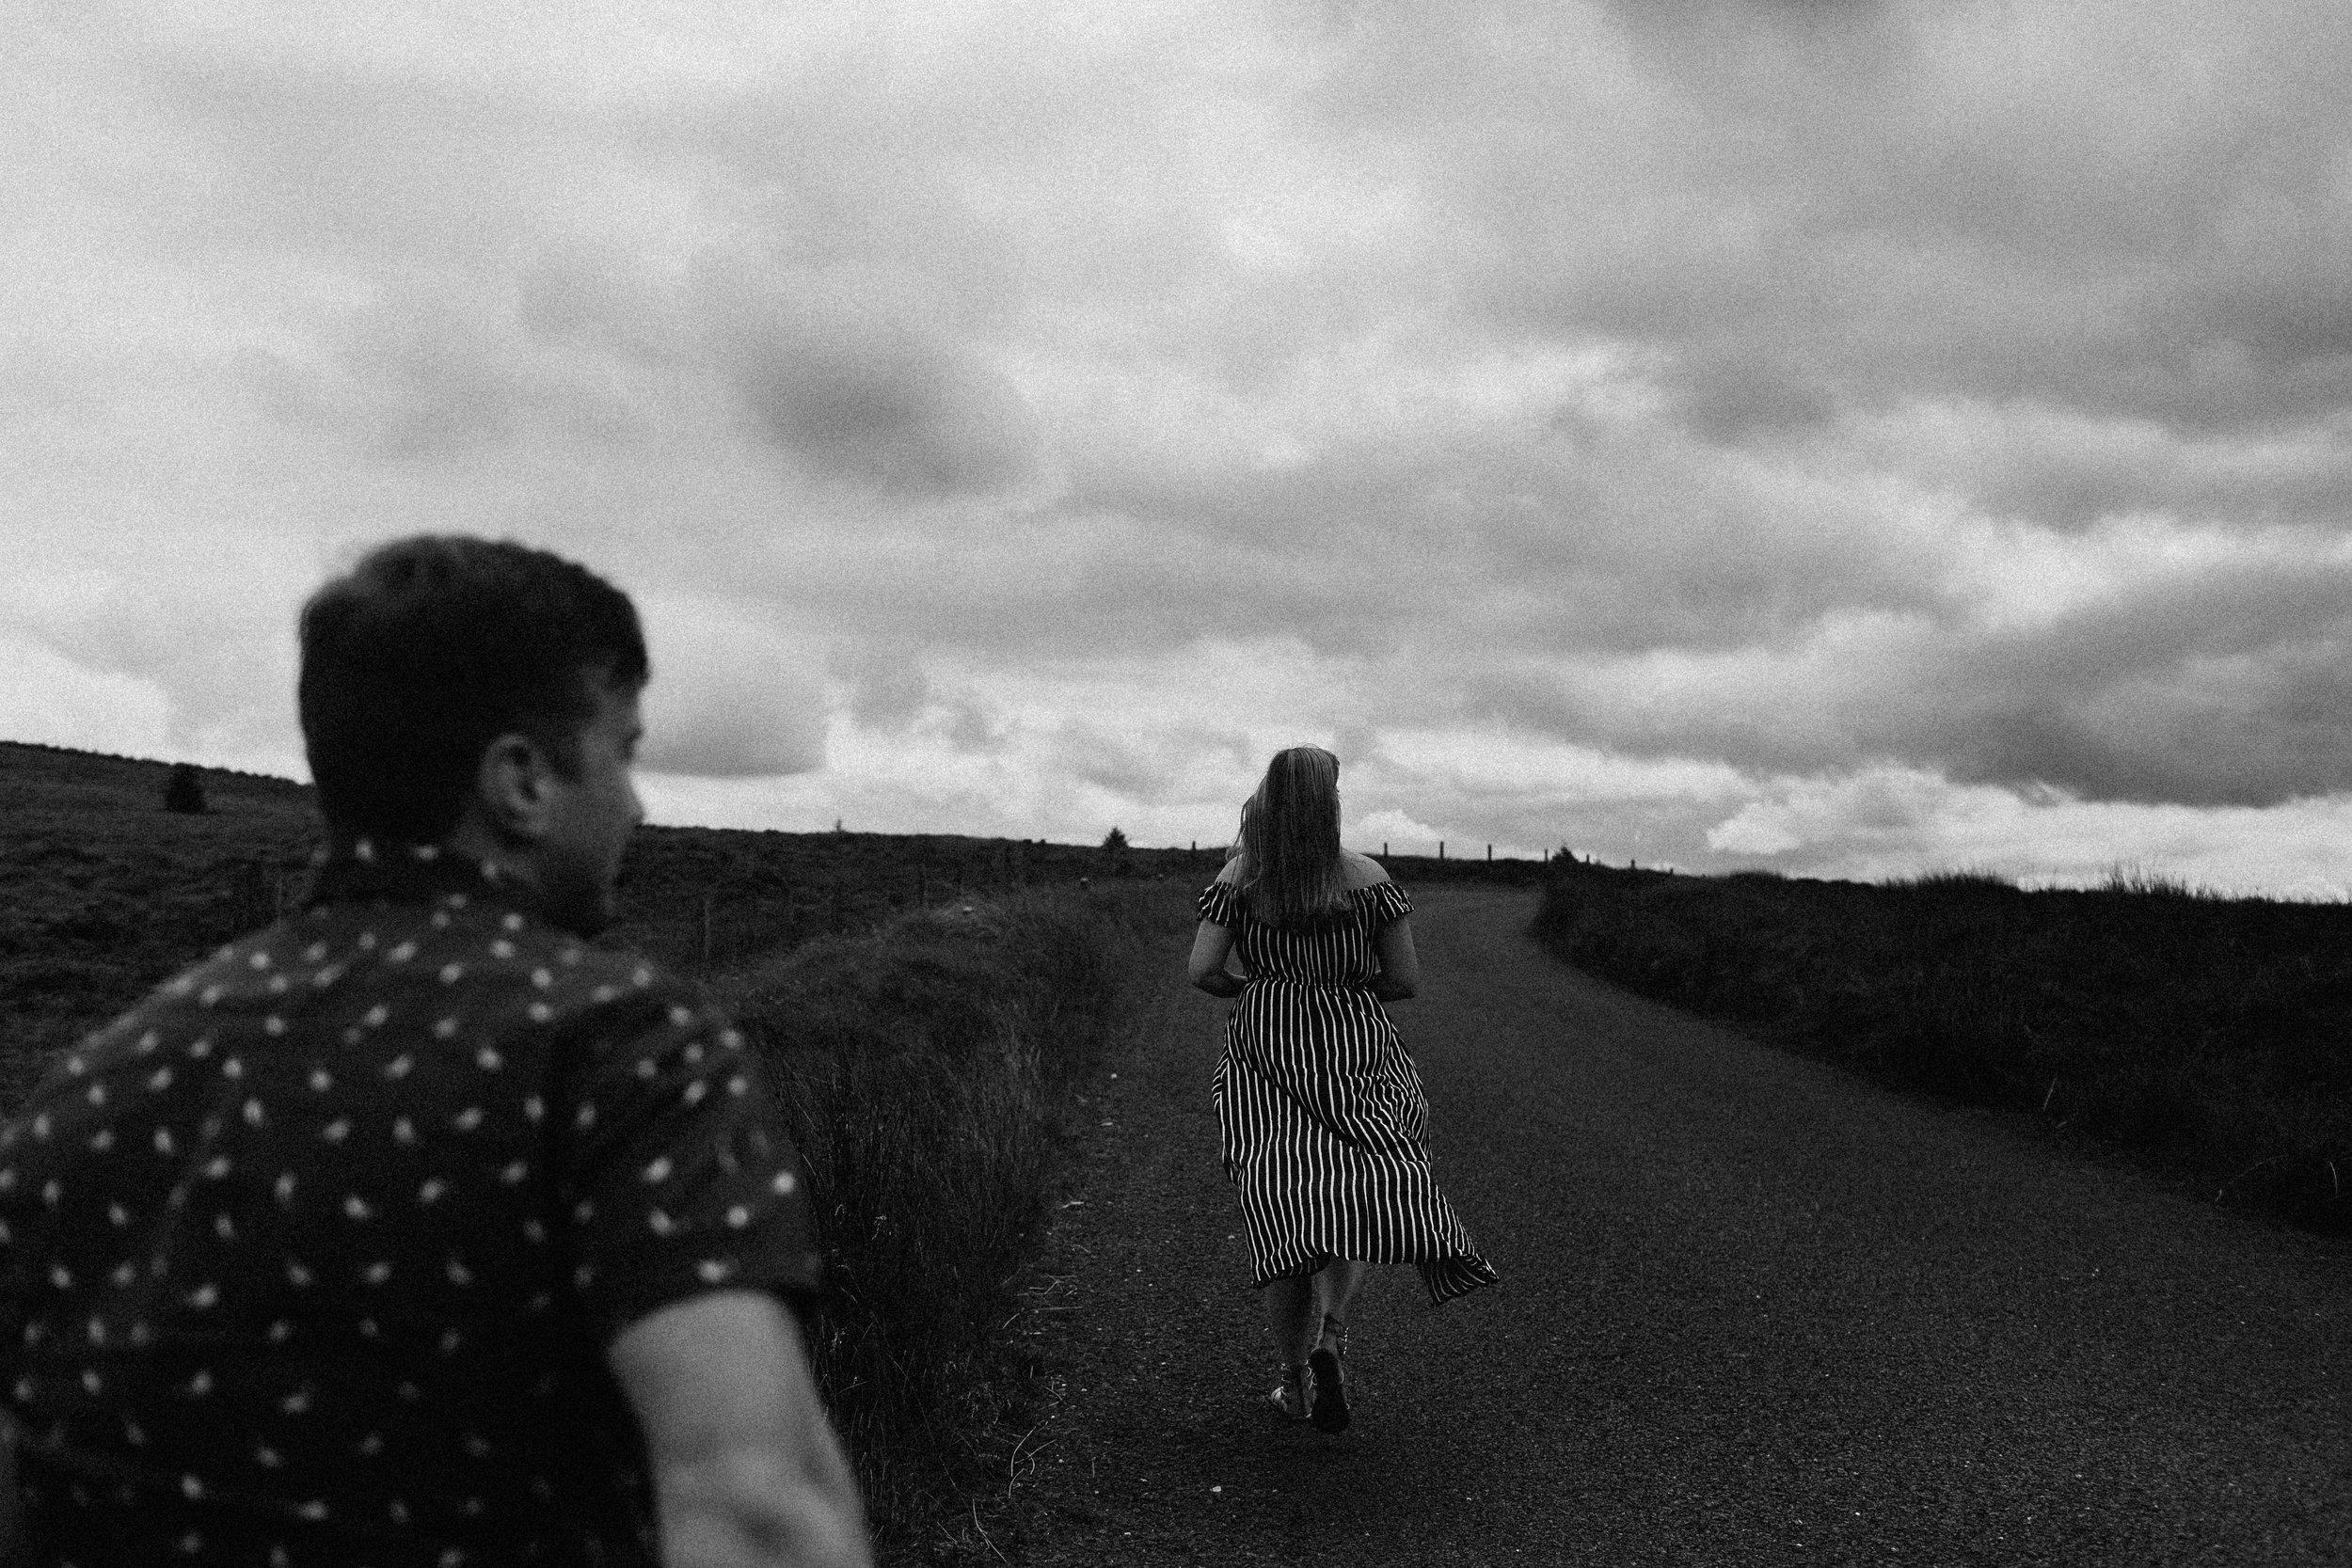 ireland_county_wicklow_glendalough_engagement_adventure_photography_windy_moody_atlanta_wedding_photographer_1157.jpg